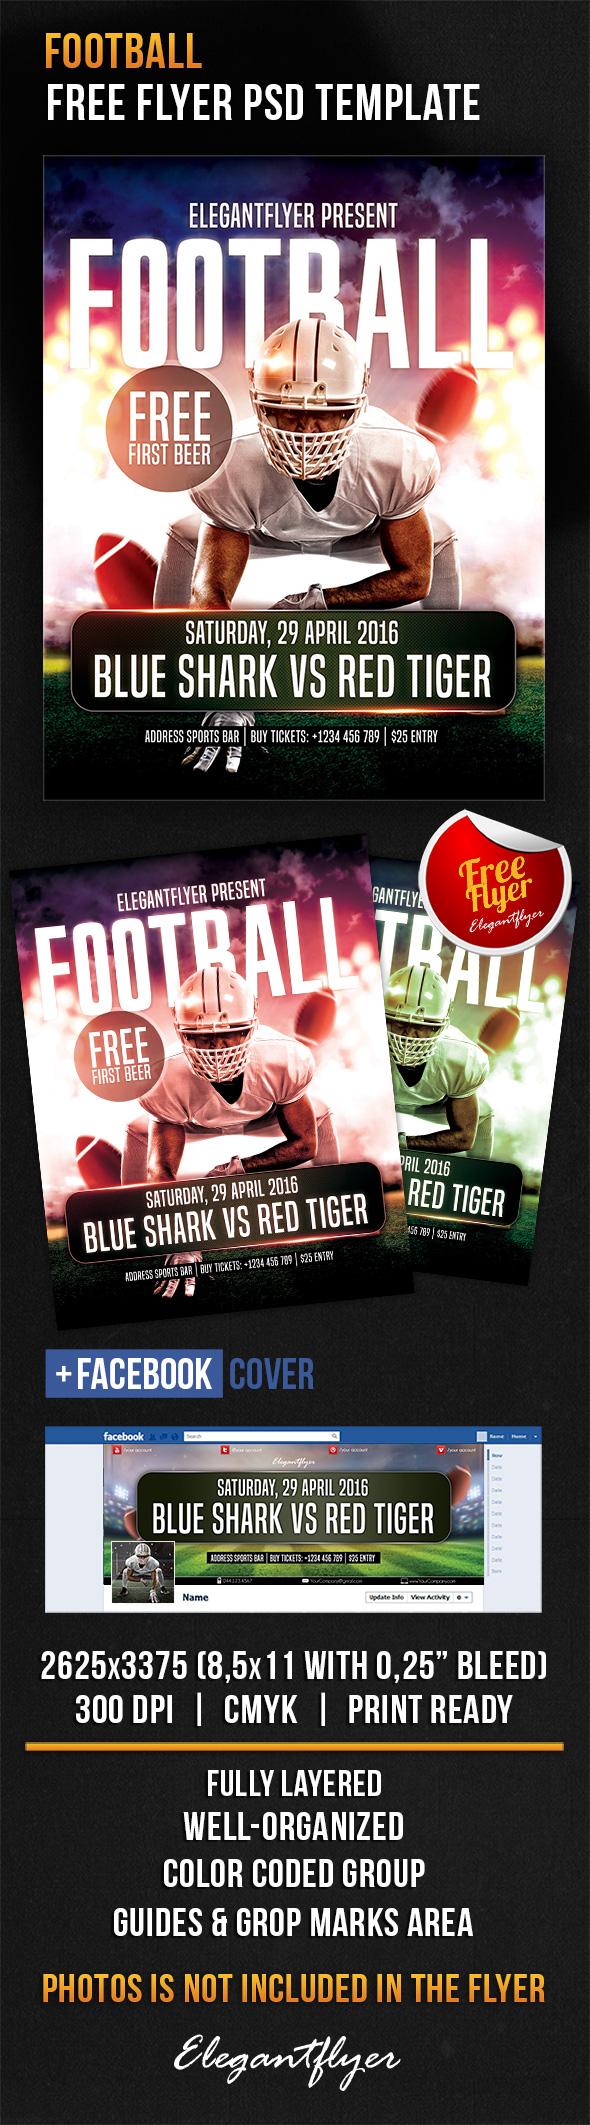 football free flyer psd template free psd flyer design 2015